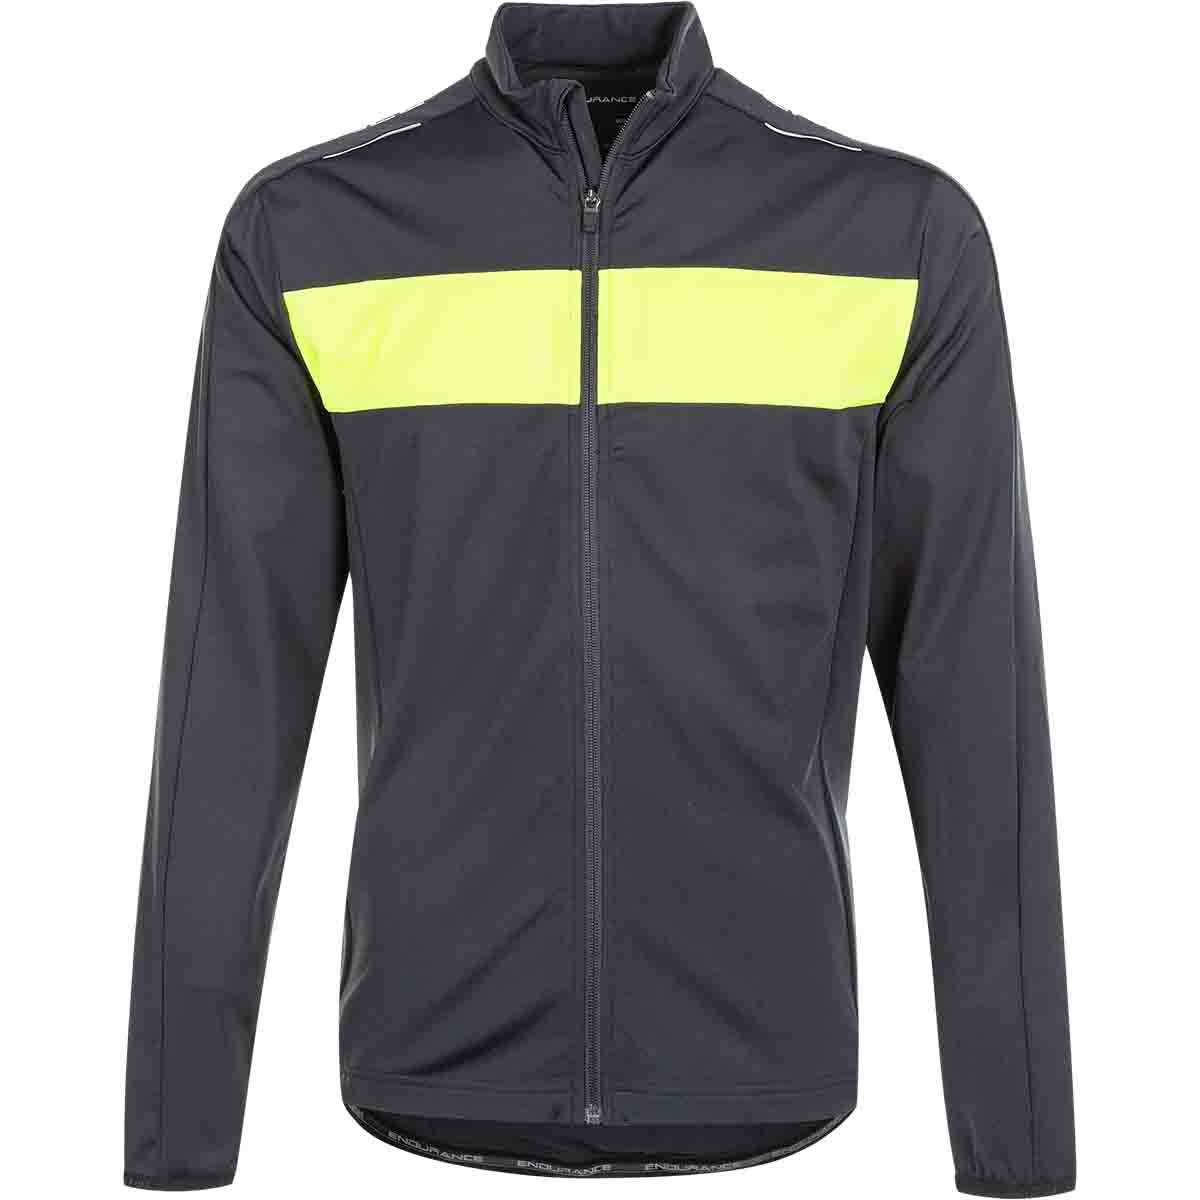 Bluza rowerowa męska Endurance San Tropez M L/S Cycling Midlayer